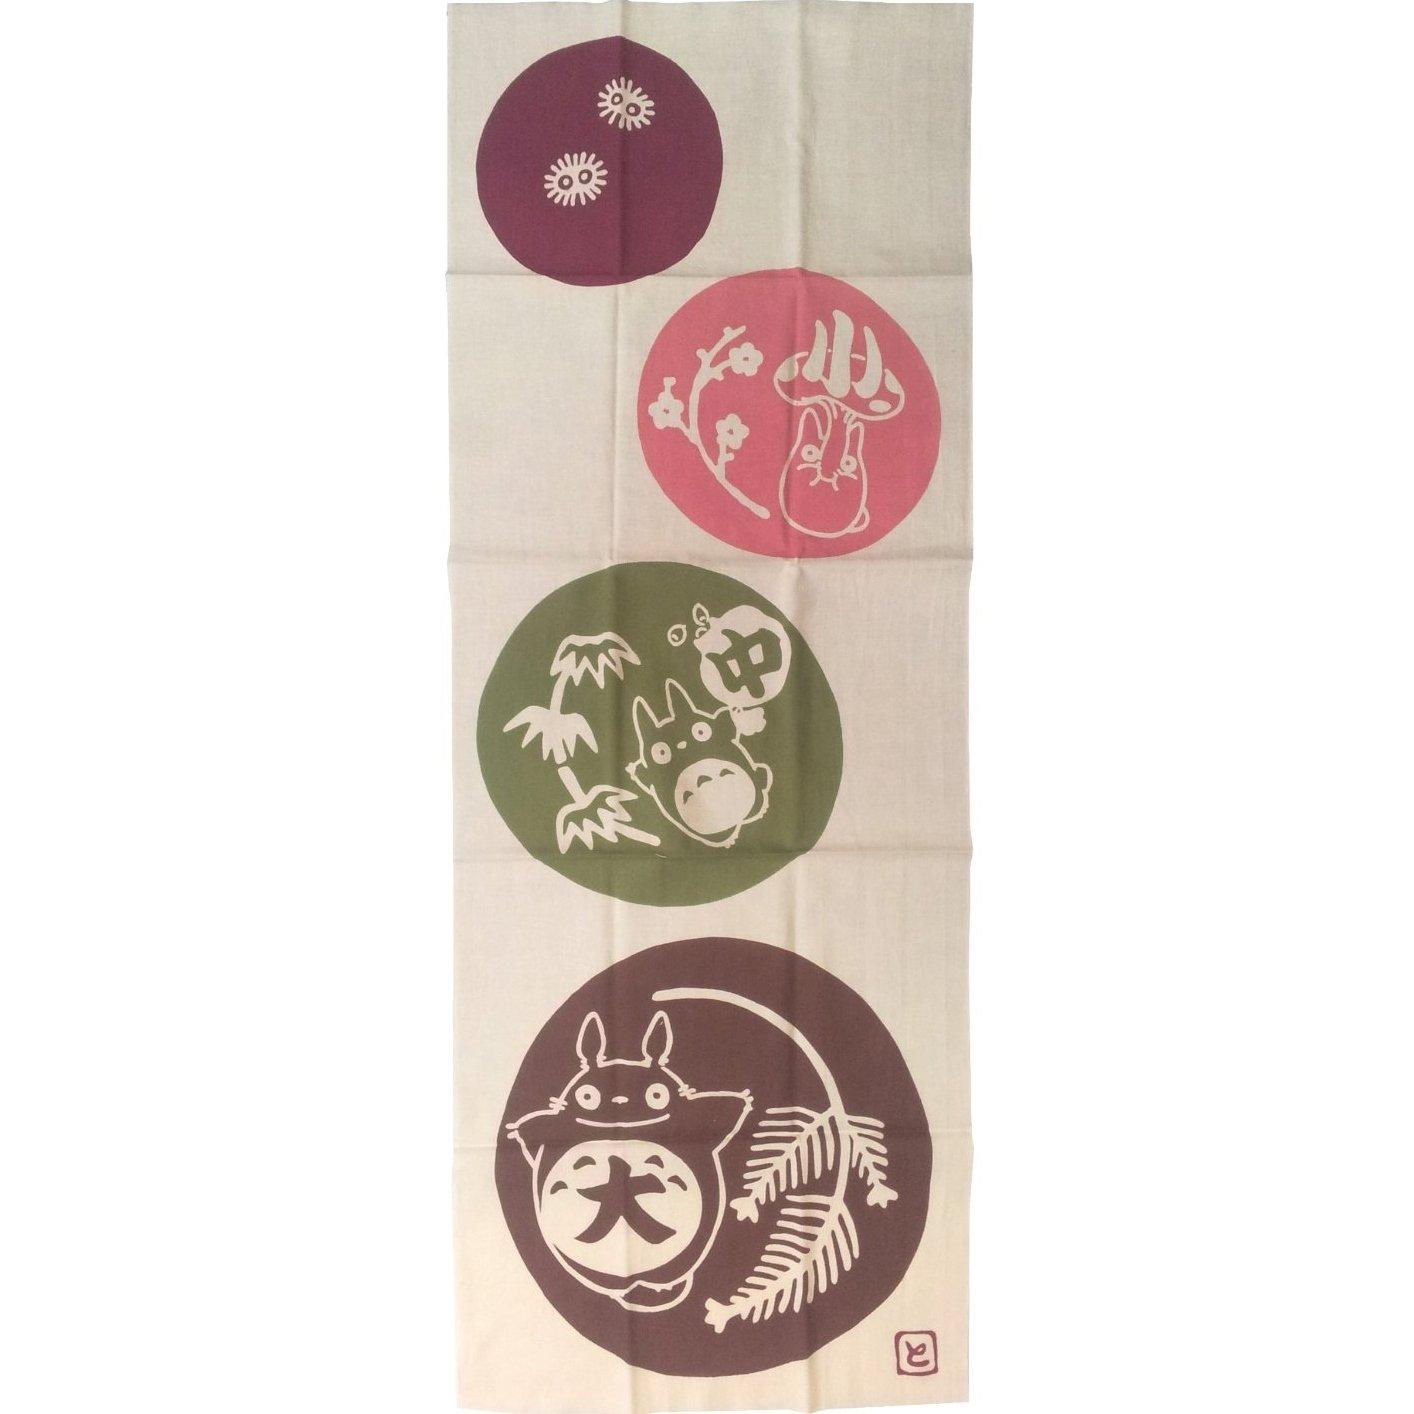 Towel / Tenugui - 33x90cm - Dyed - Shochikubai - Totoro - made Japan - no production (new)